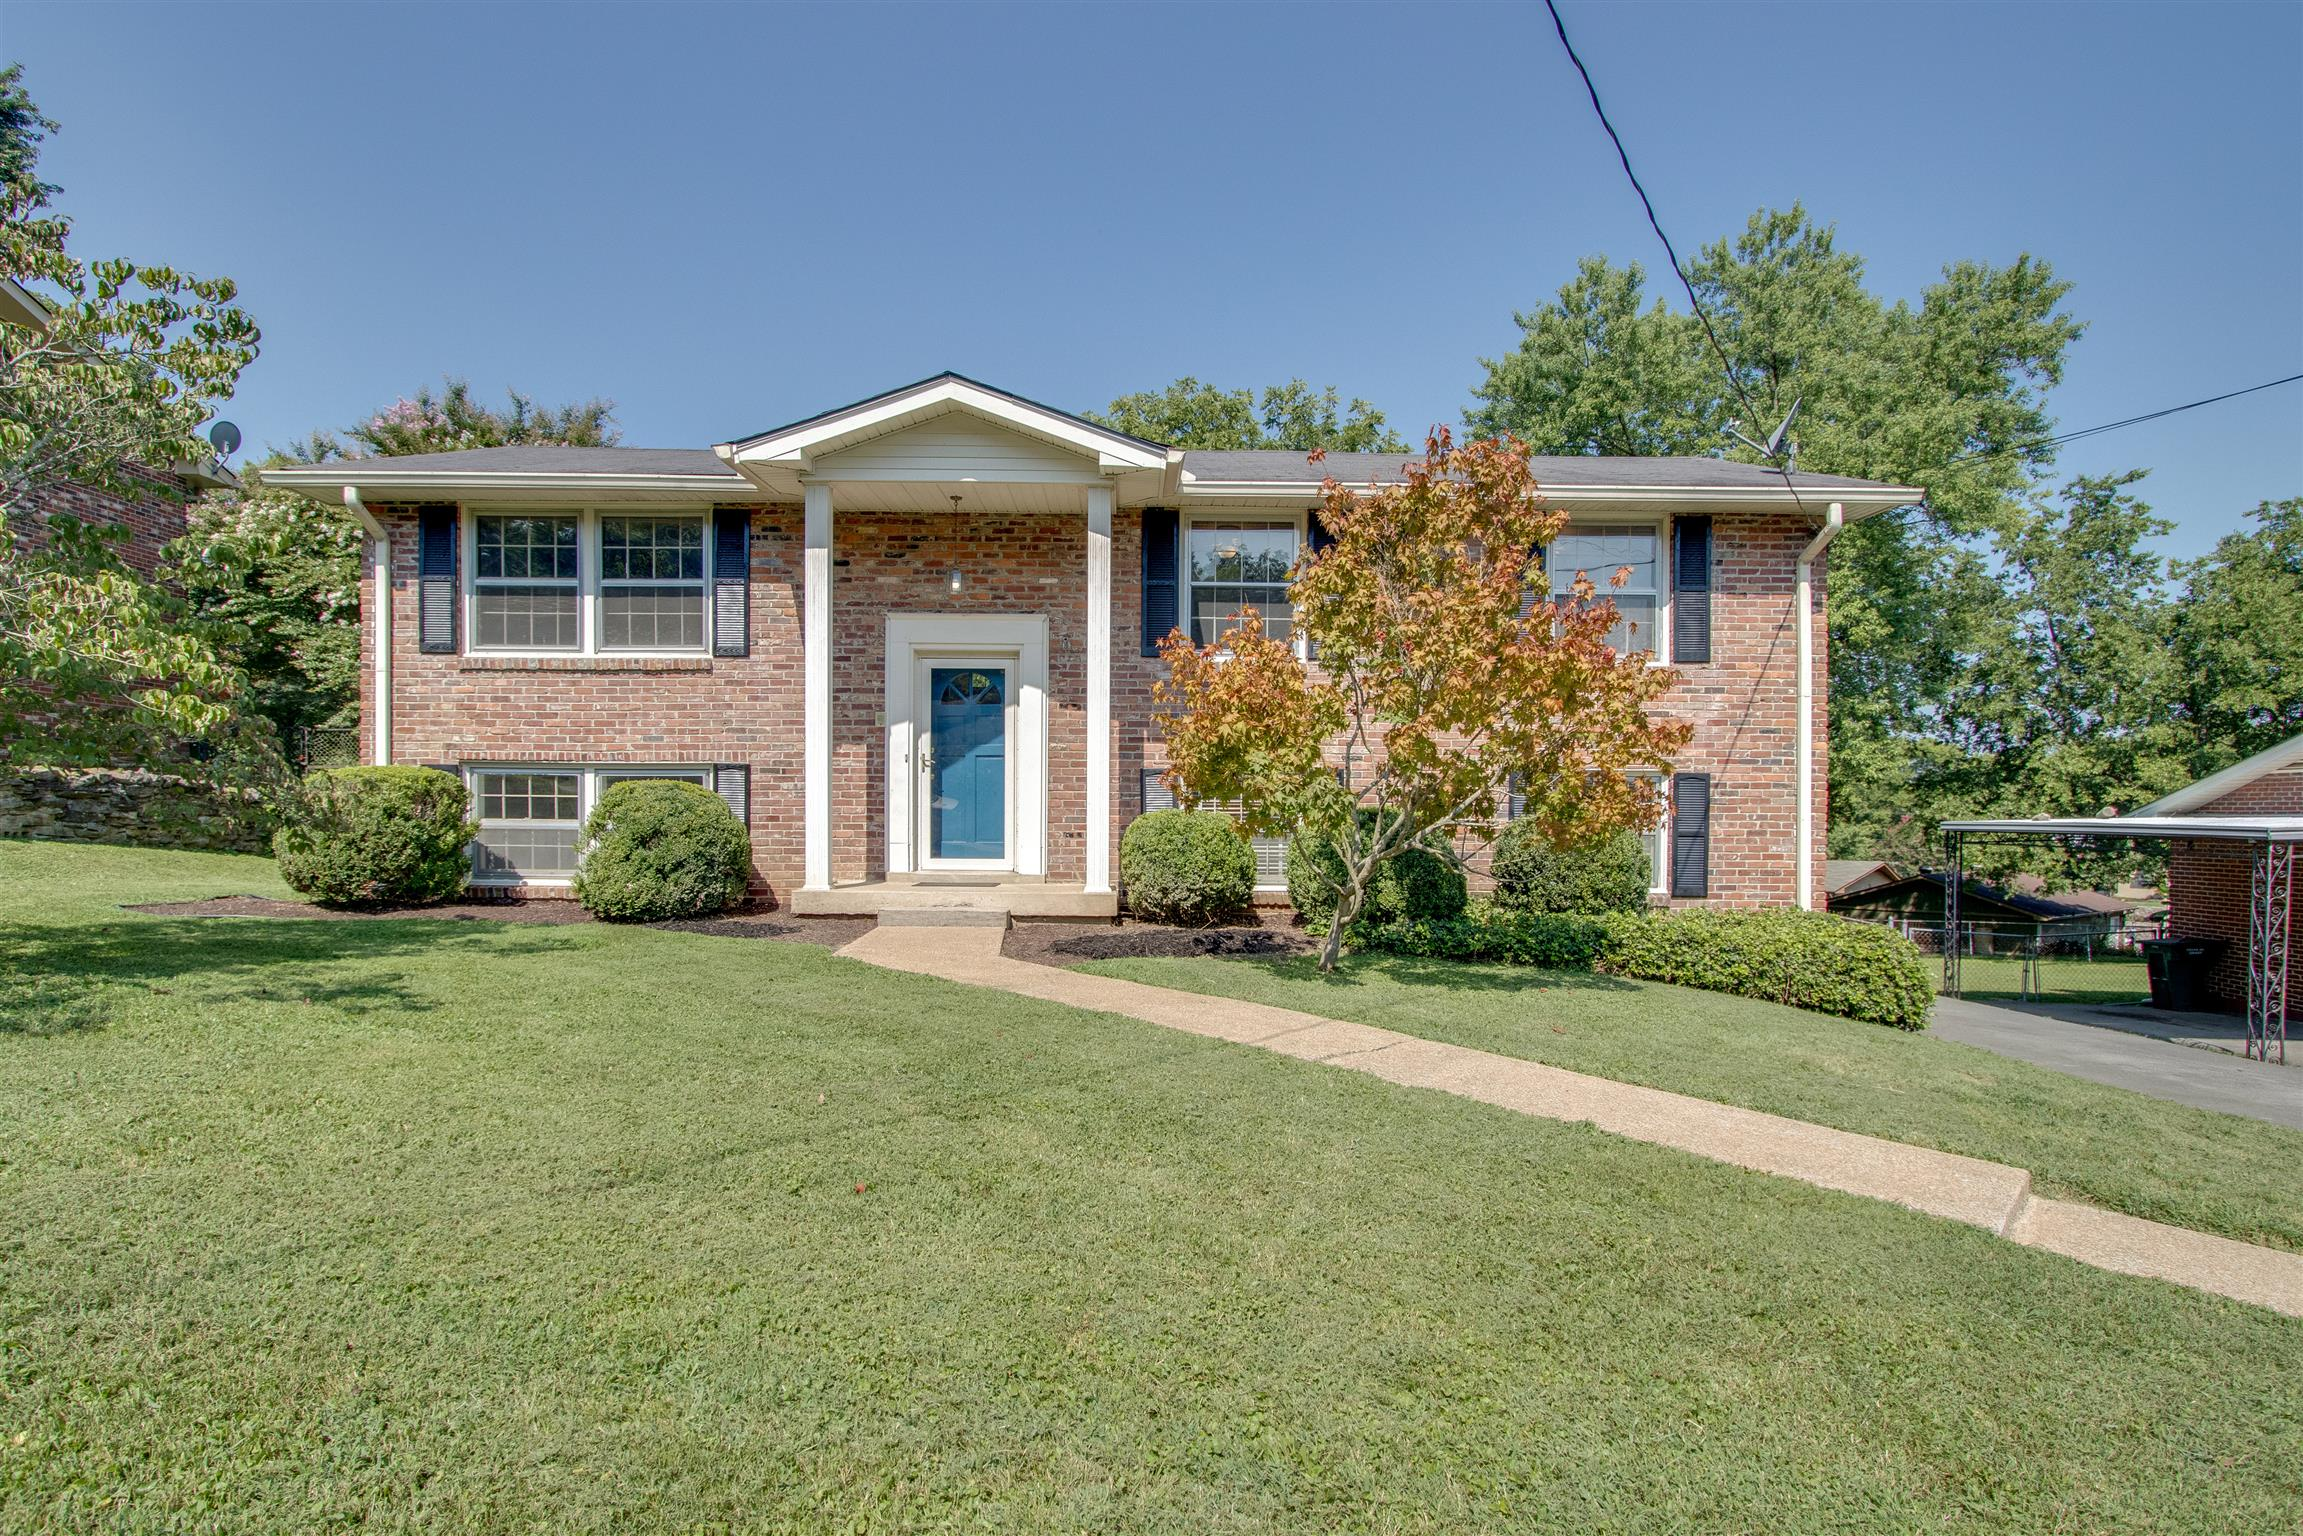 172 Bonnafield Dr, Hermitage, TN 37076 - Hermitage, TN real estate listing